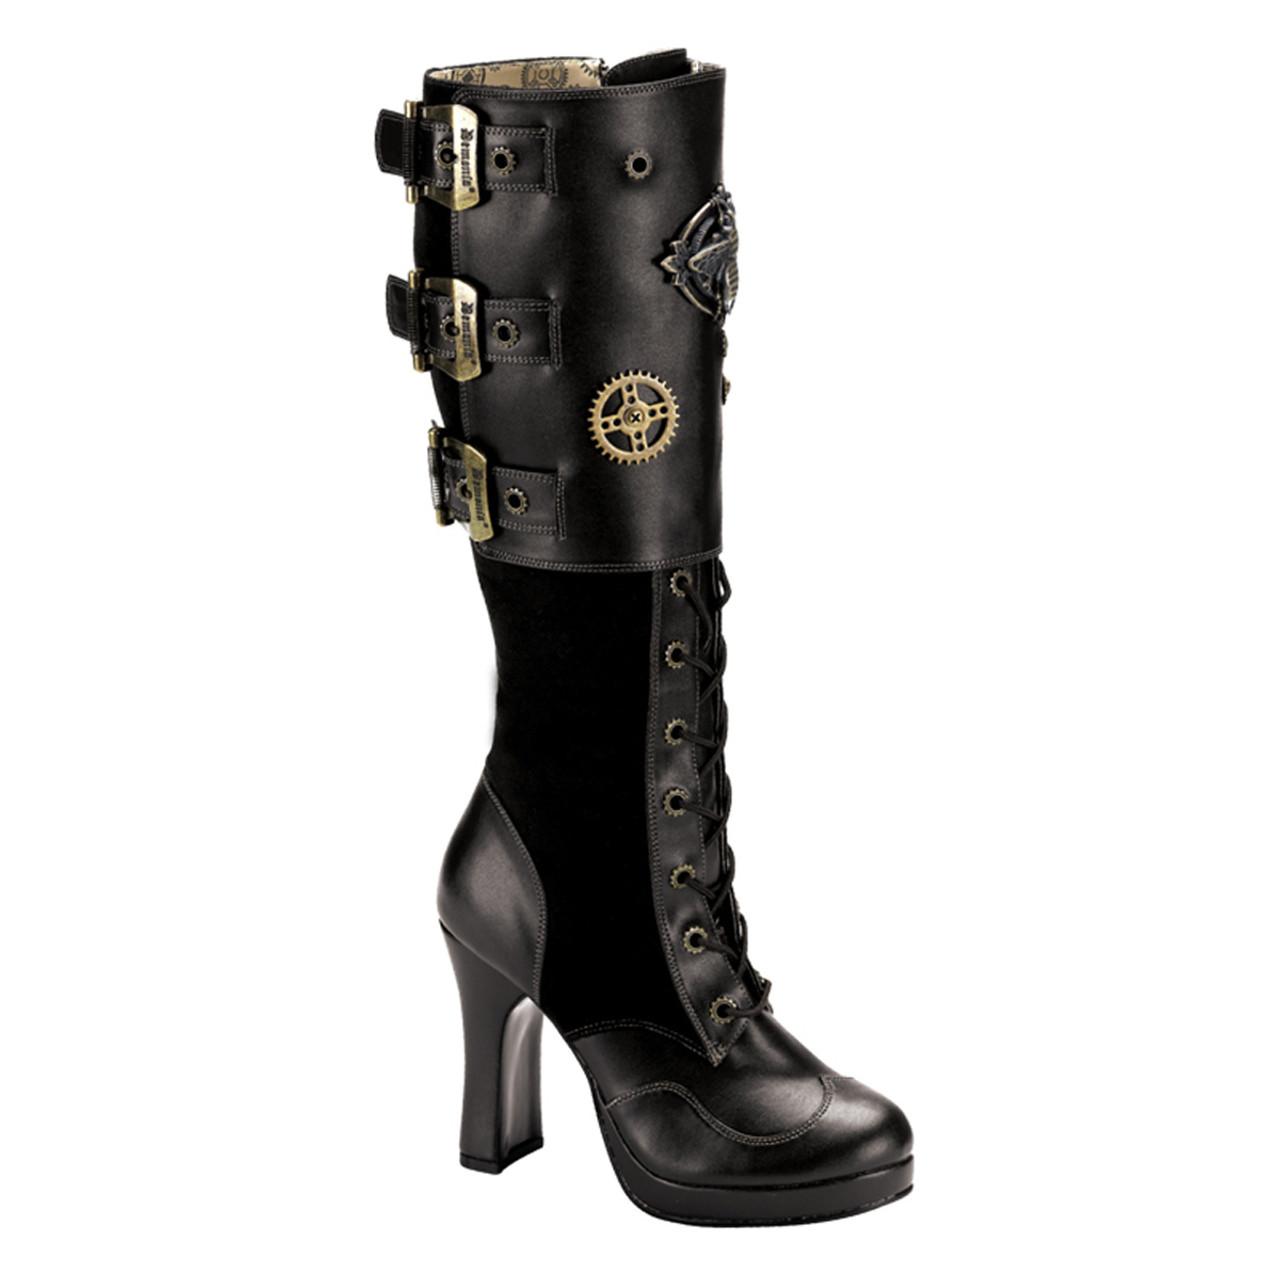 "Demonia 3.75/"" Heel Black Gothic Steampunk Calf Buckle Boots 6 7 8 9 10 11 12"